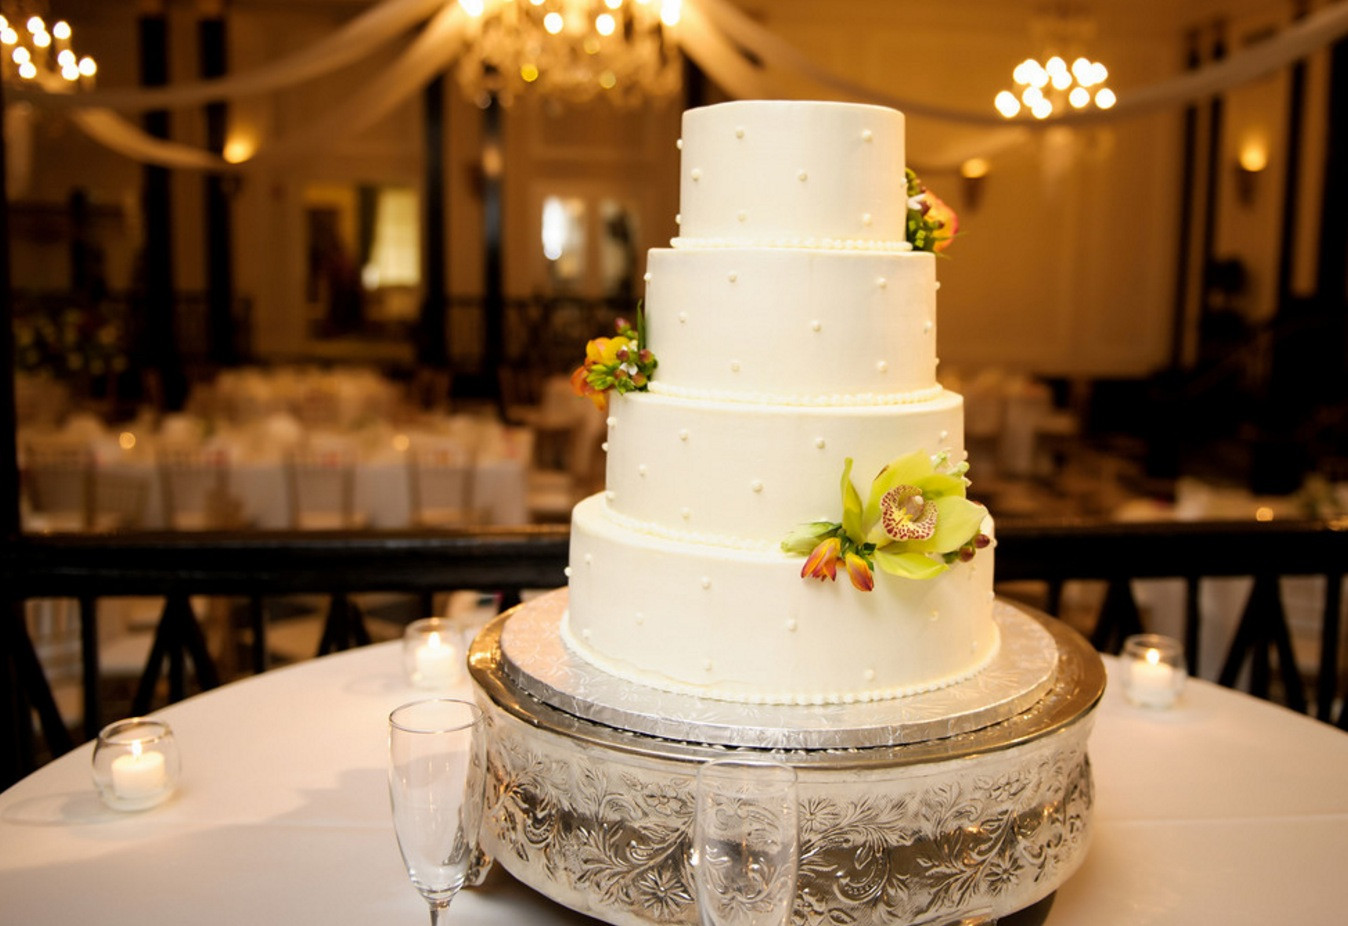 Wedding Cakes Durham Nc  Wedding Cakes Gallery Guglhupf